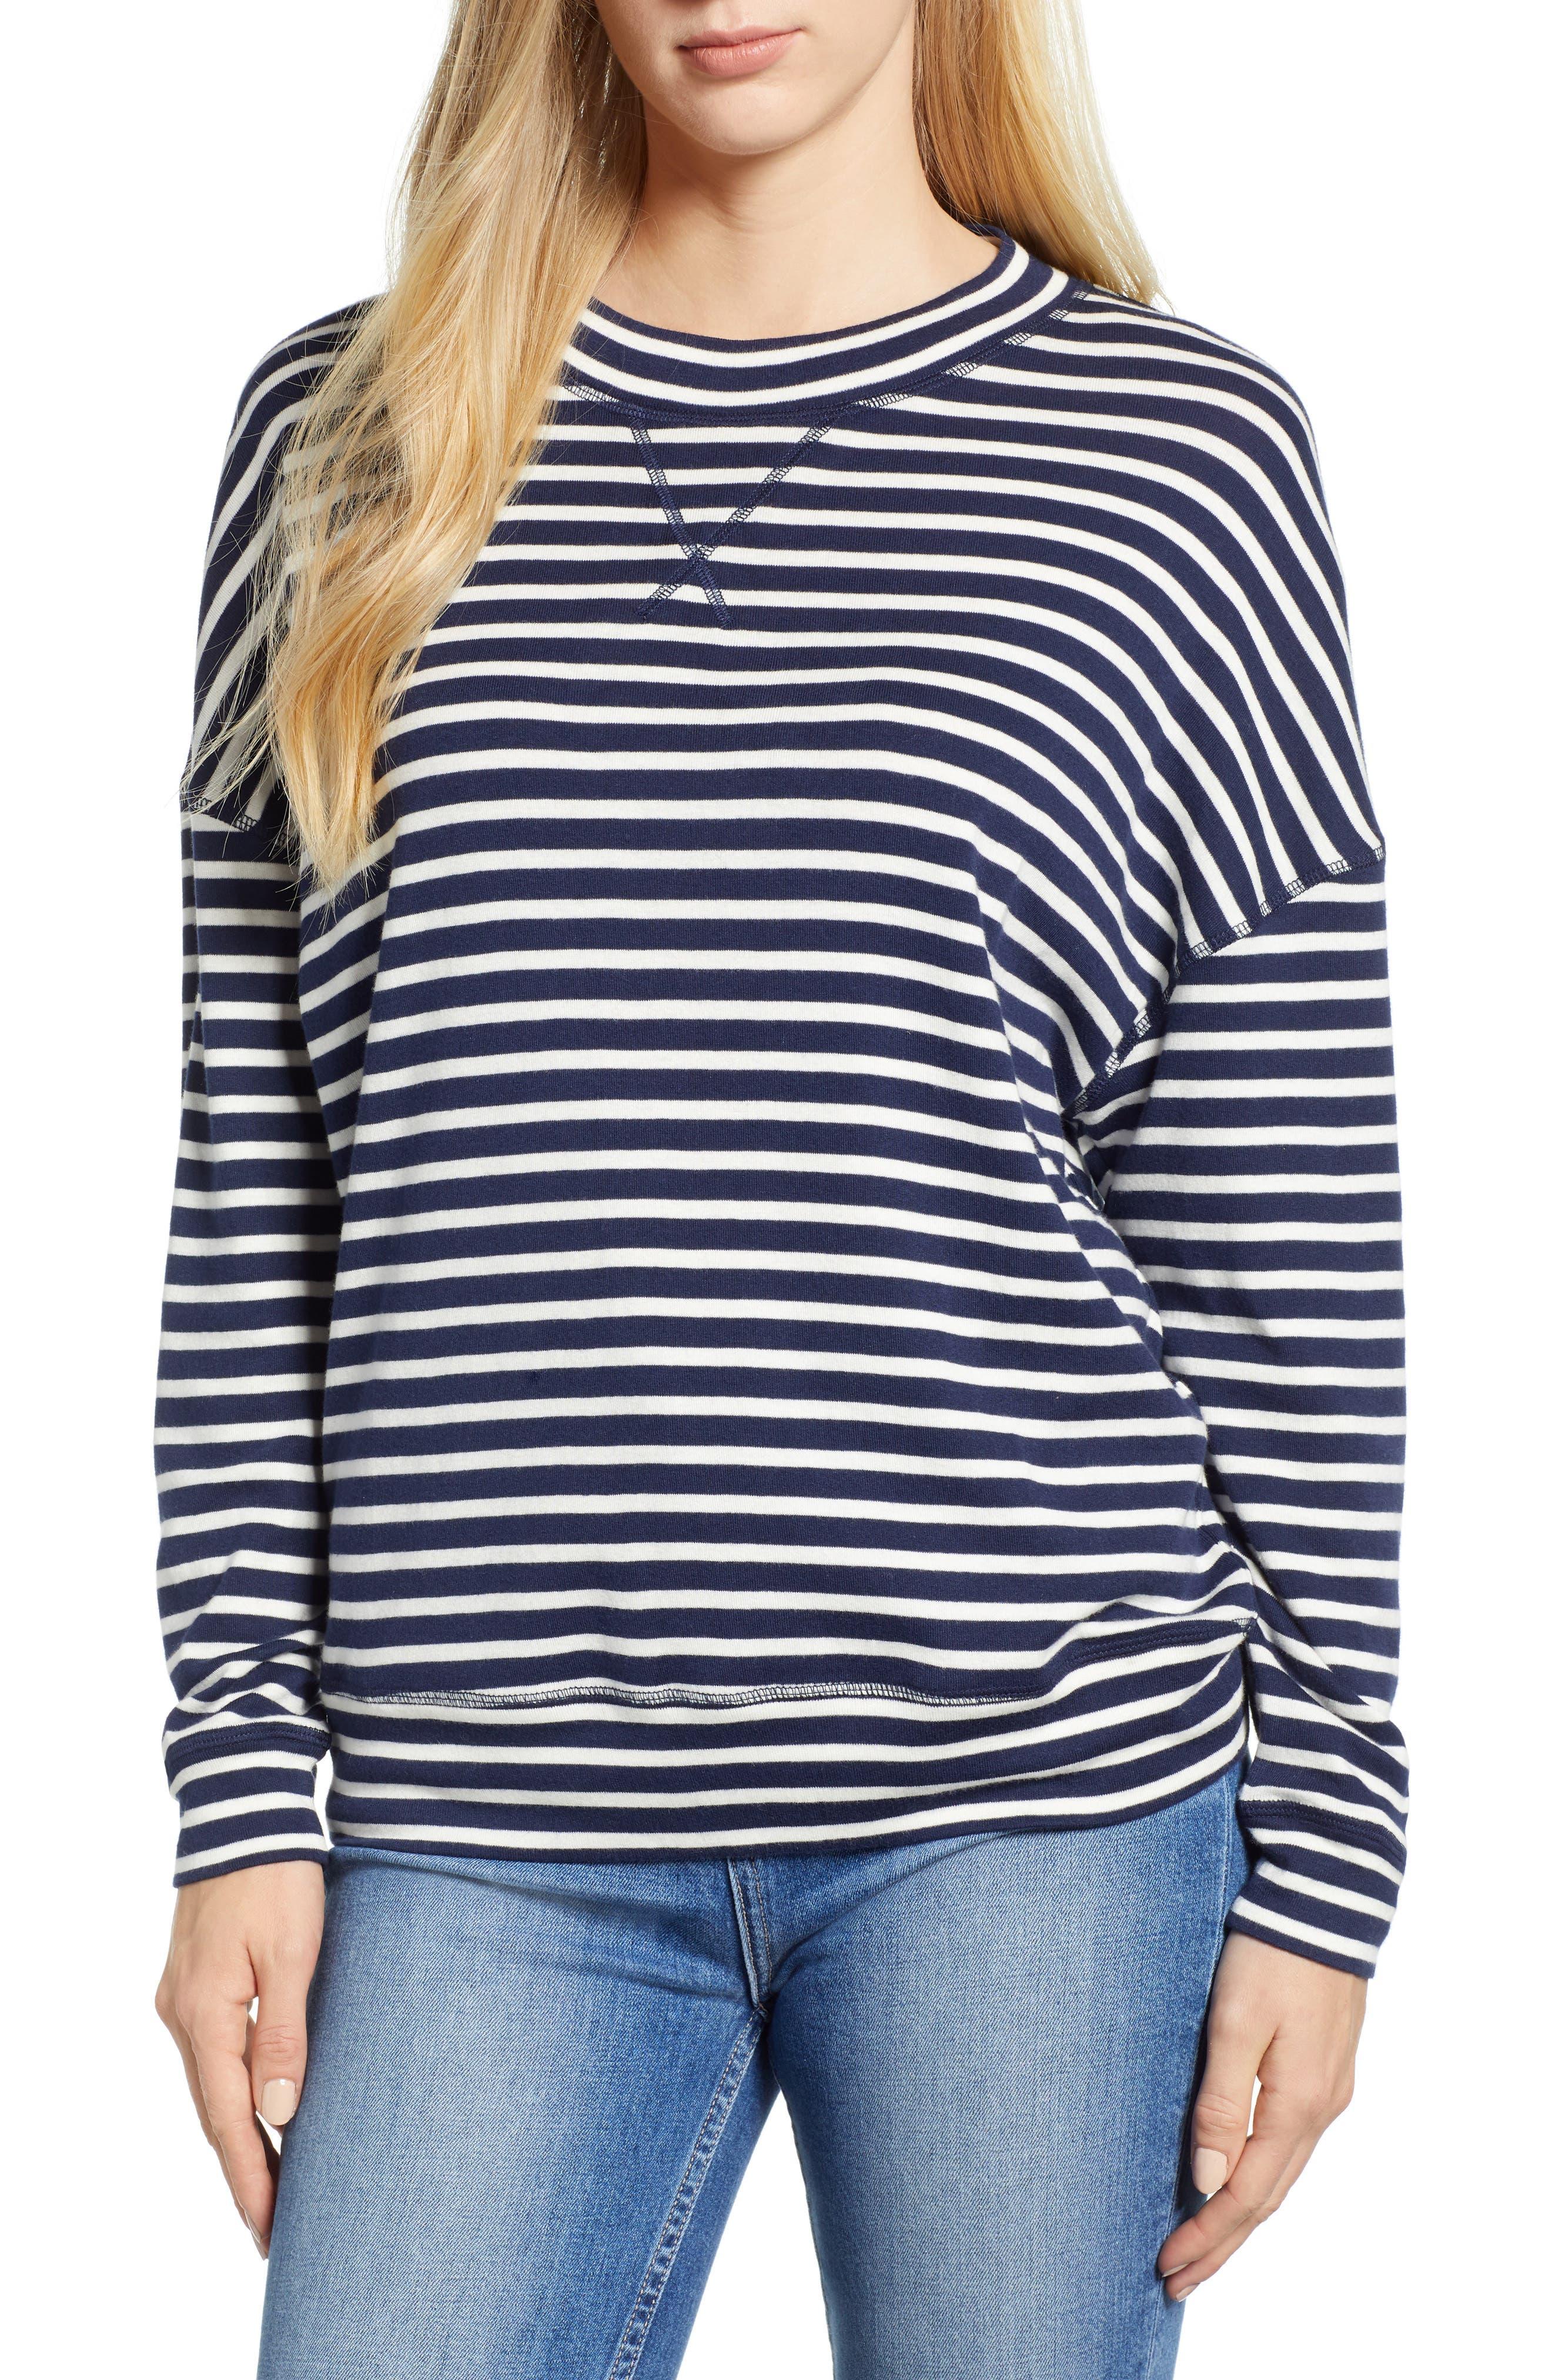 CASLON<SUP>®</SUP> Sweatshirt, Main, color, NAVY/ IVORY KATINKA STRIPE